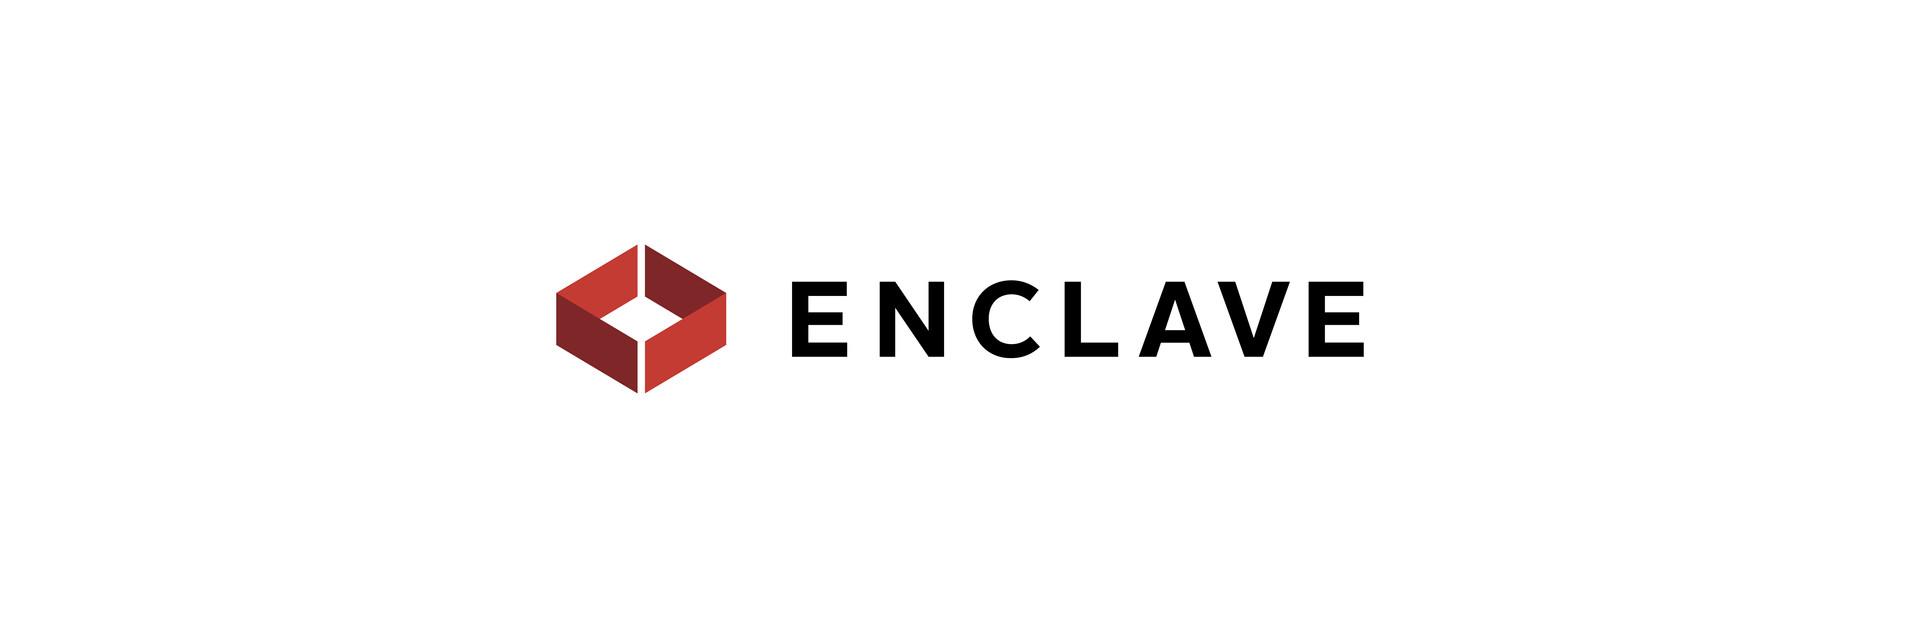 New Enclave Logo